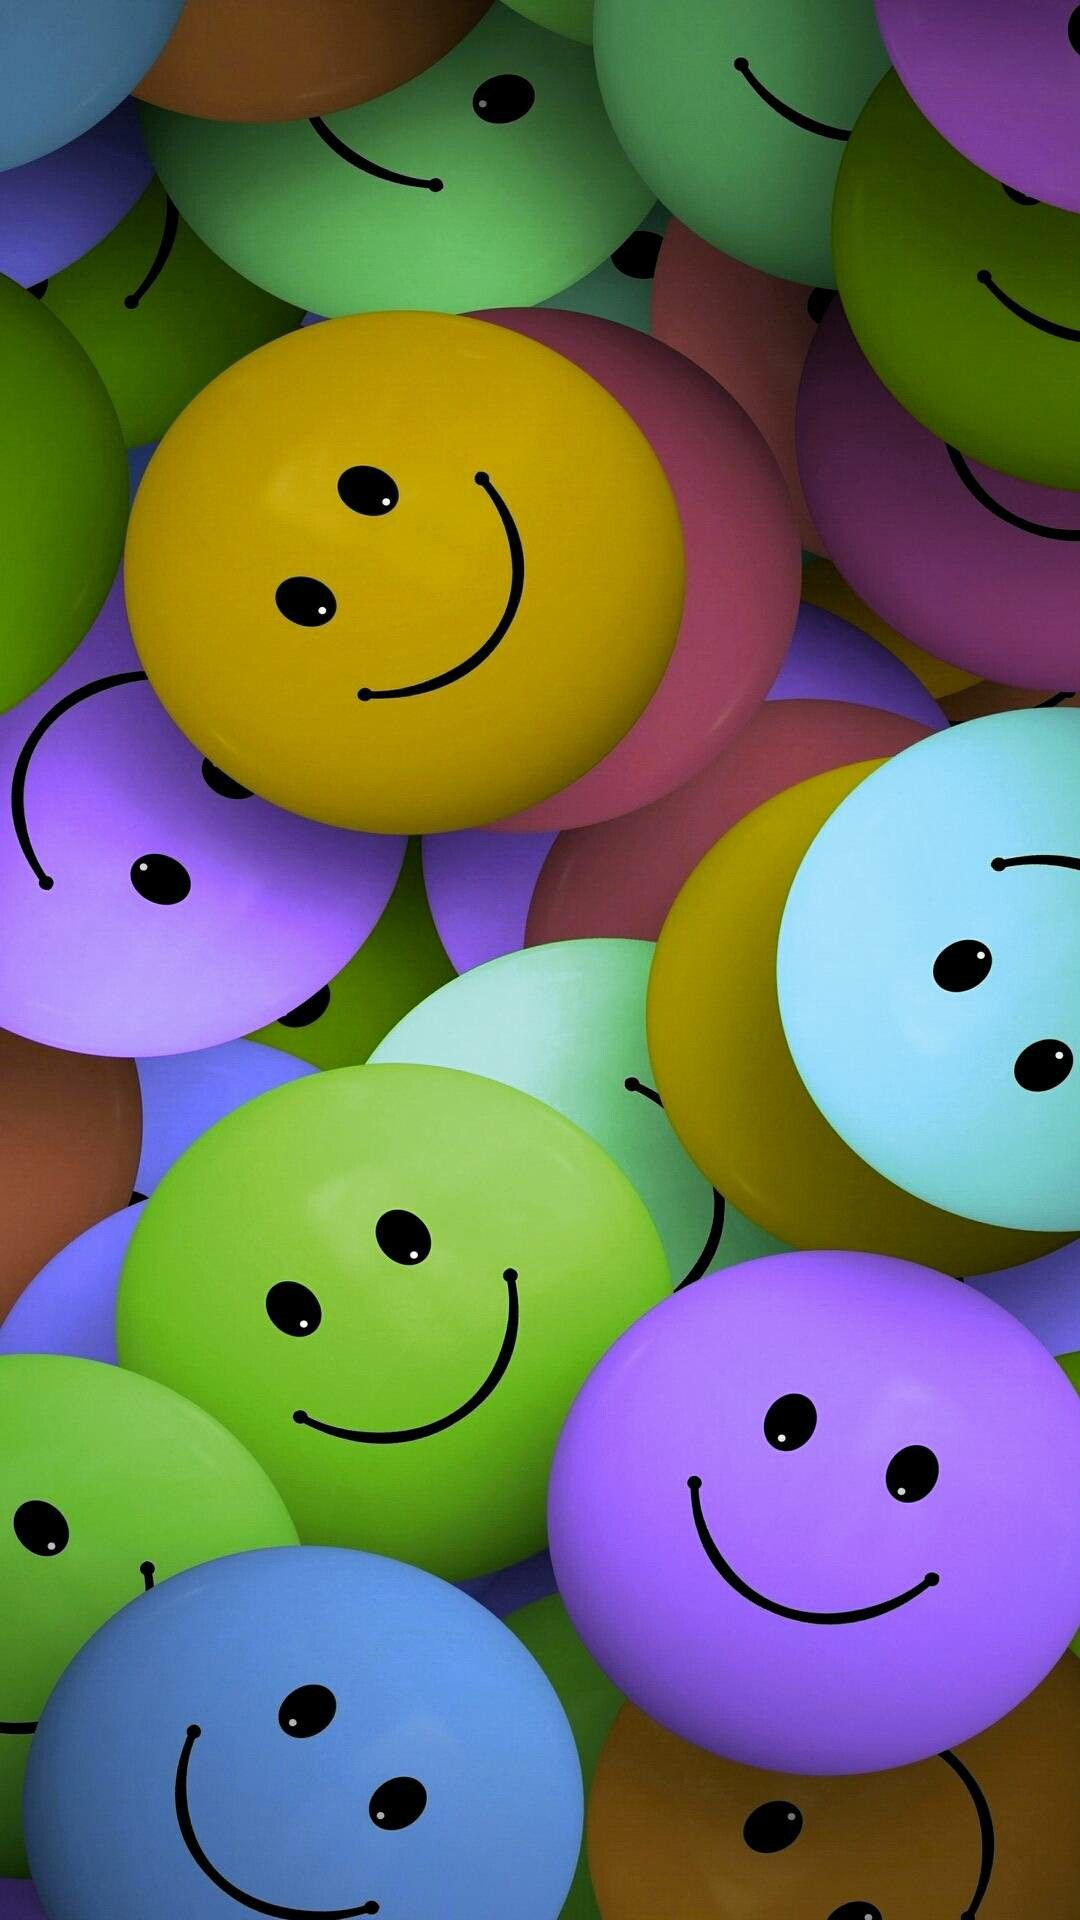 Pin By Ona Haxhillari On Phone Backgrounds Hipster 14 Emoji Wallpaper Happy Wallpaper Smile Wallpaper